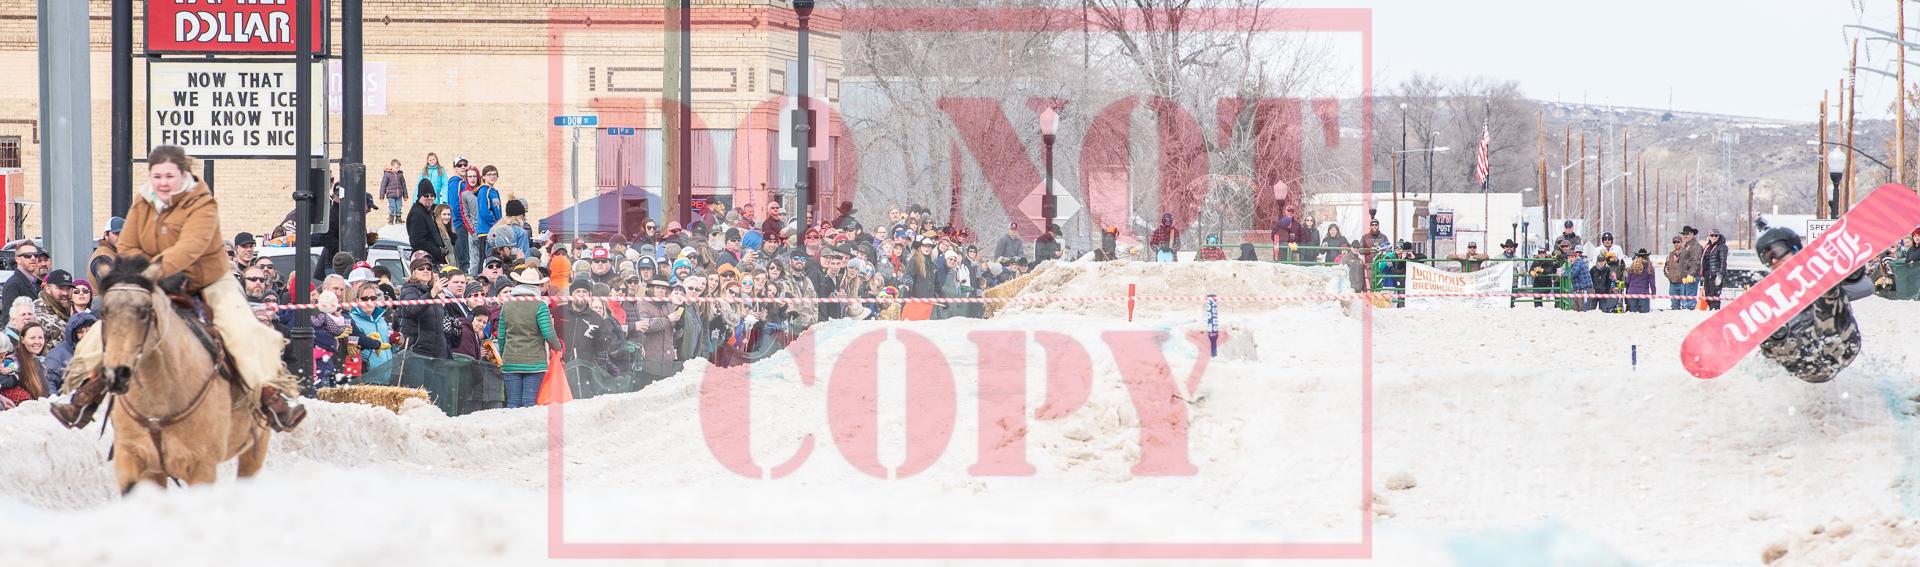 - Cody McKenzie - Snowboard 1